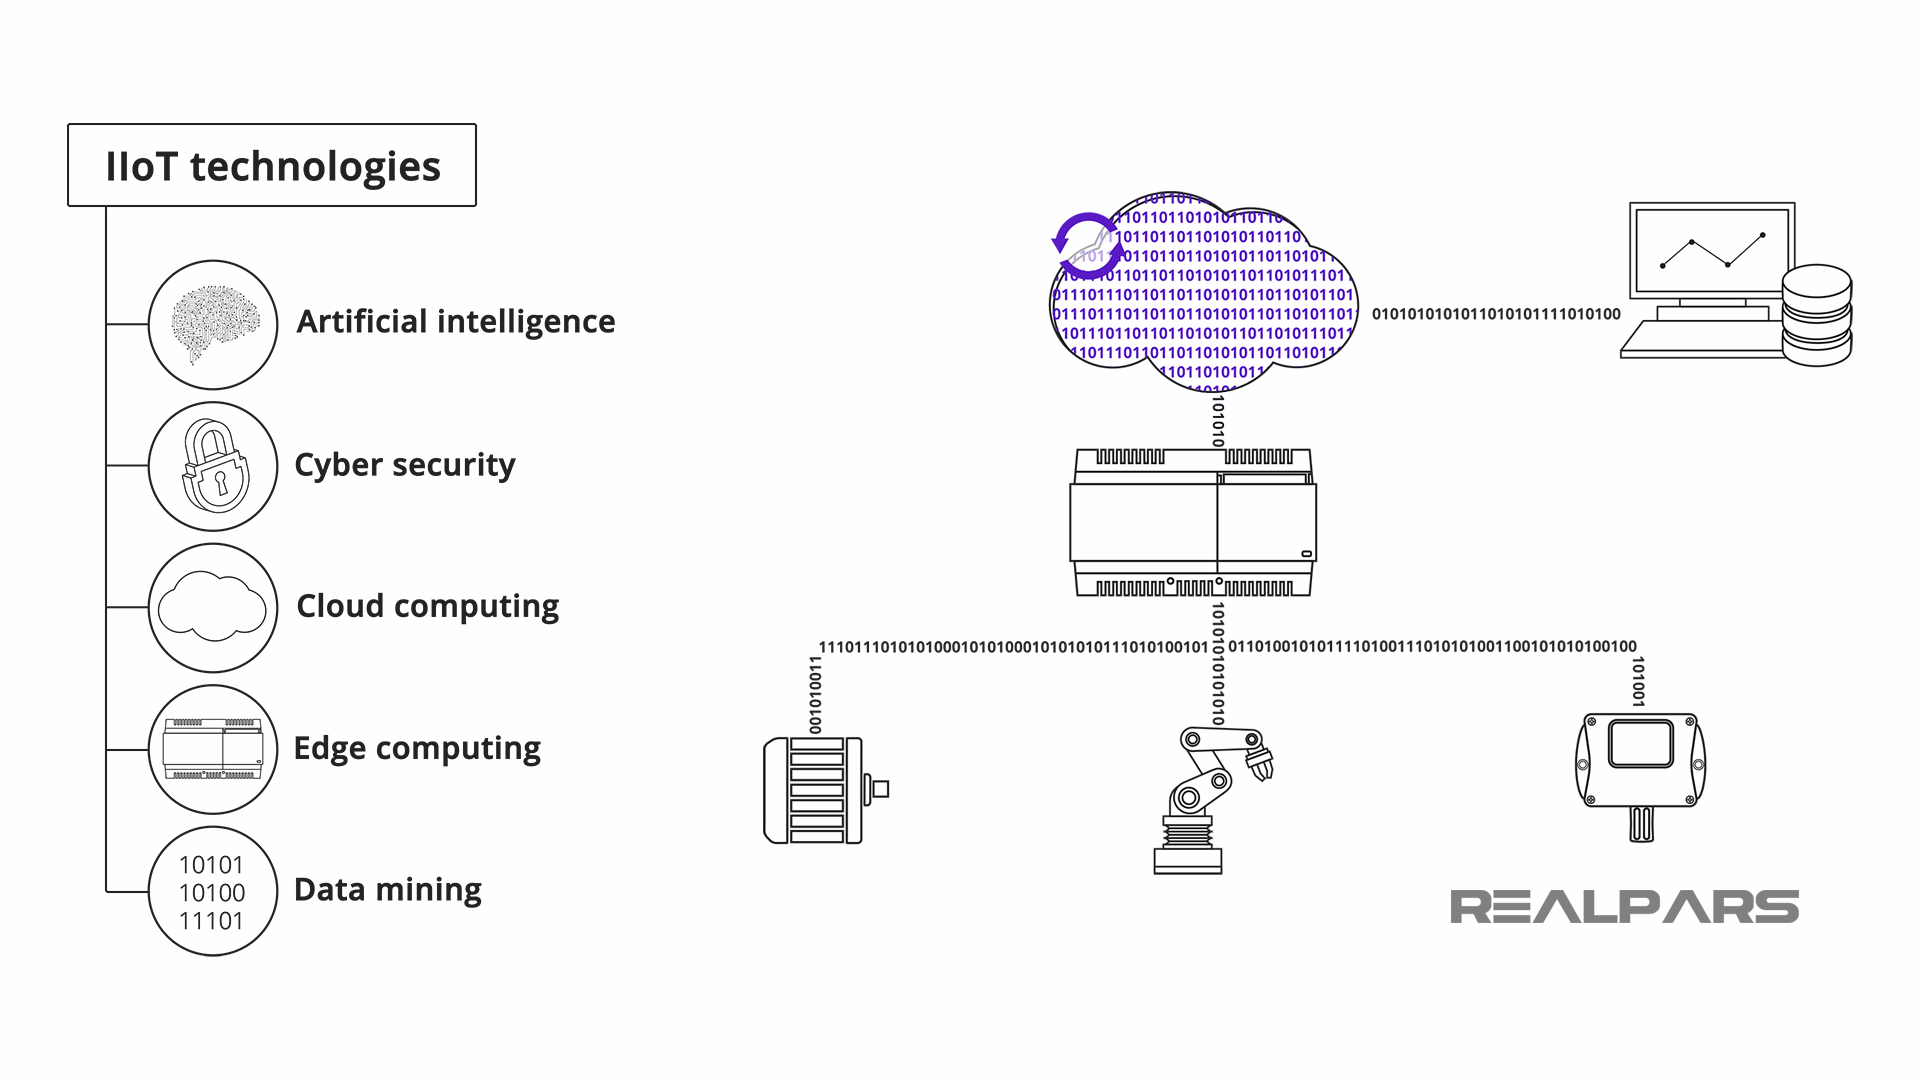 IIoT key Technologies